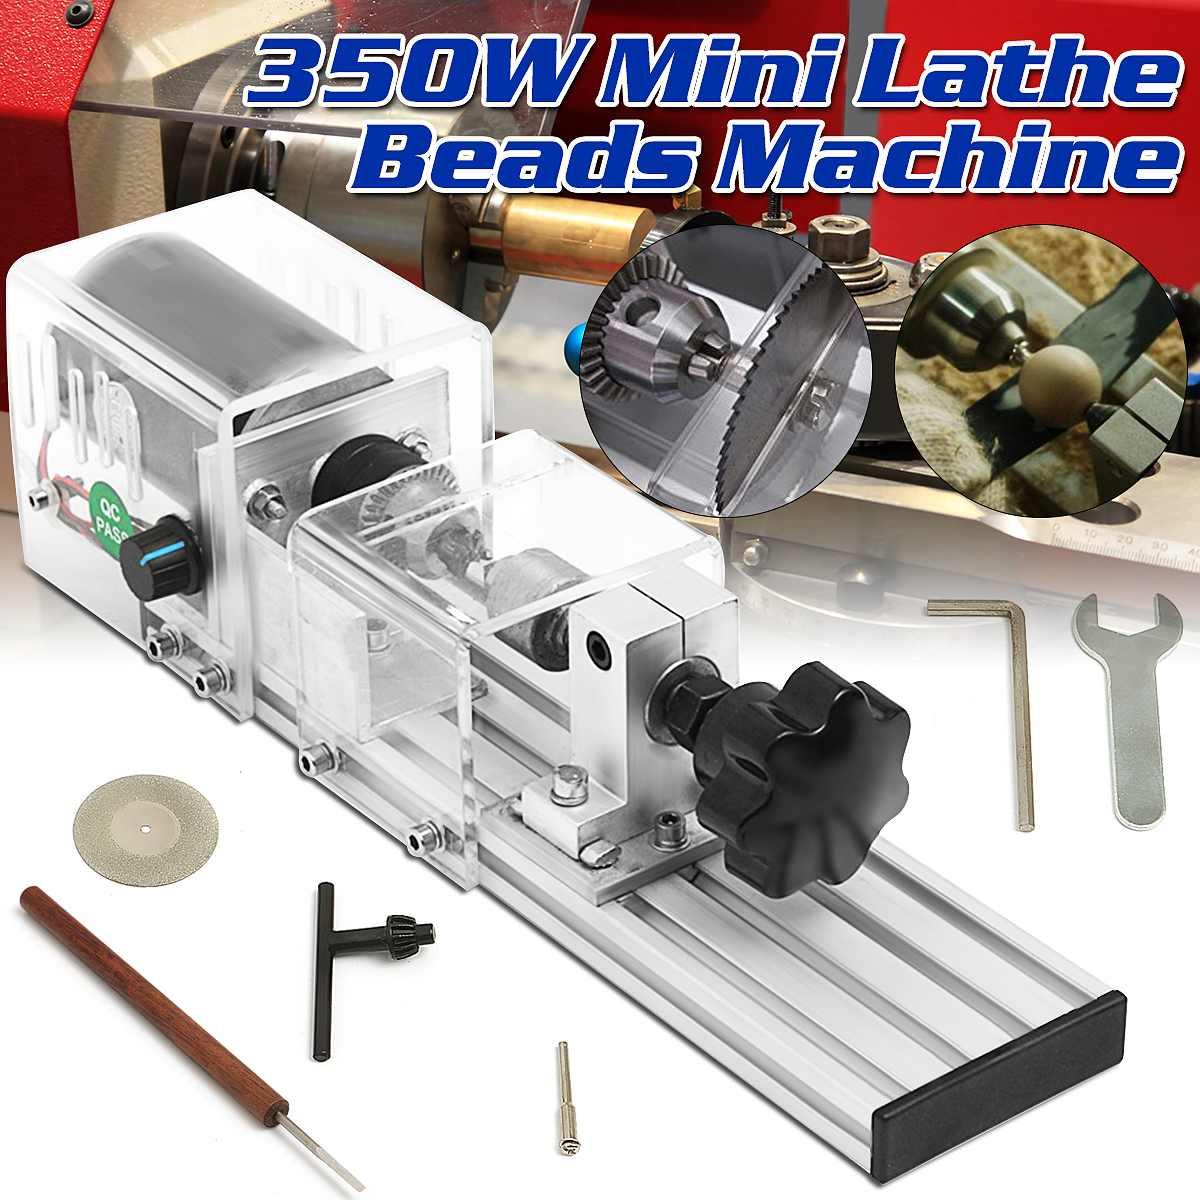 350W Precisions Mini Wood Lathe Machine DIY Woodworking Lathe Polishing Cutting Drill Rotary Tool Standard Set Benches Drill